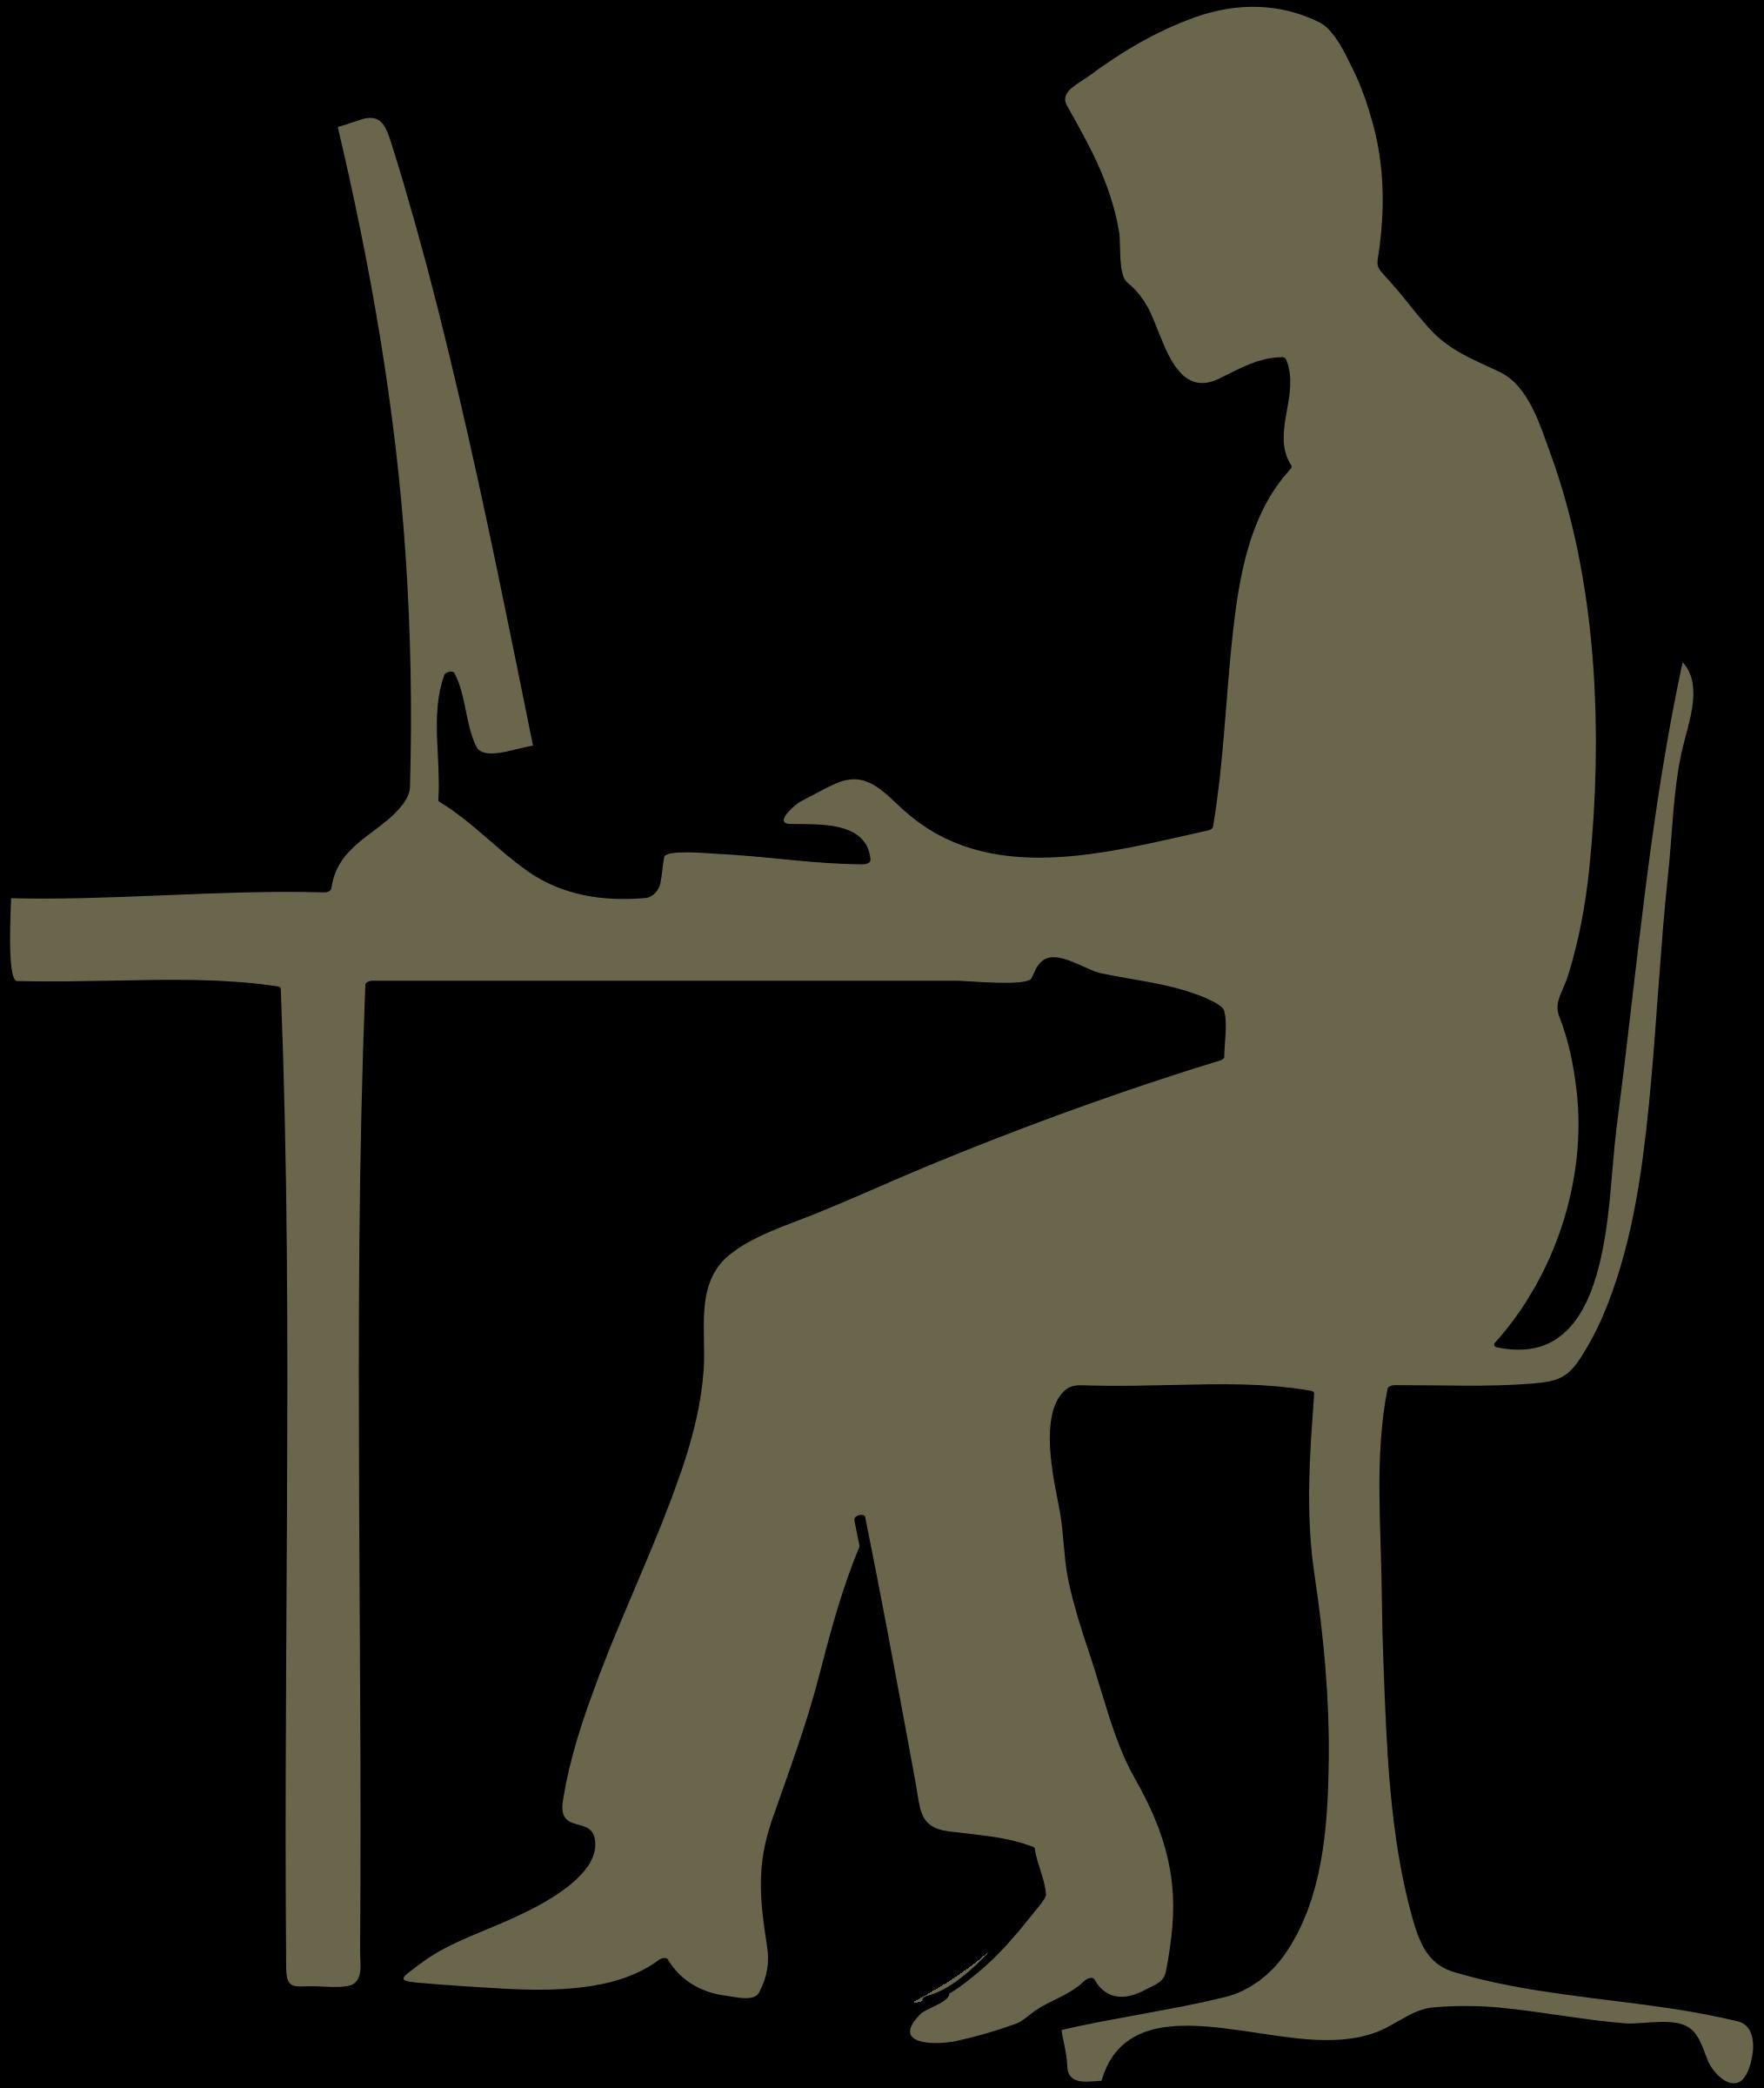 Computer clip art silhouette. Clipart desk big image